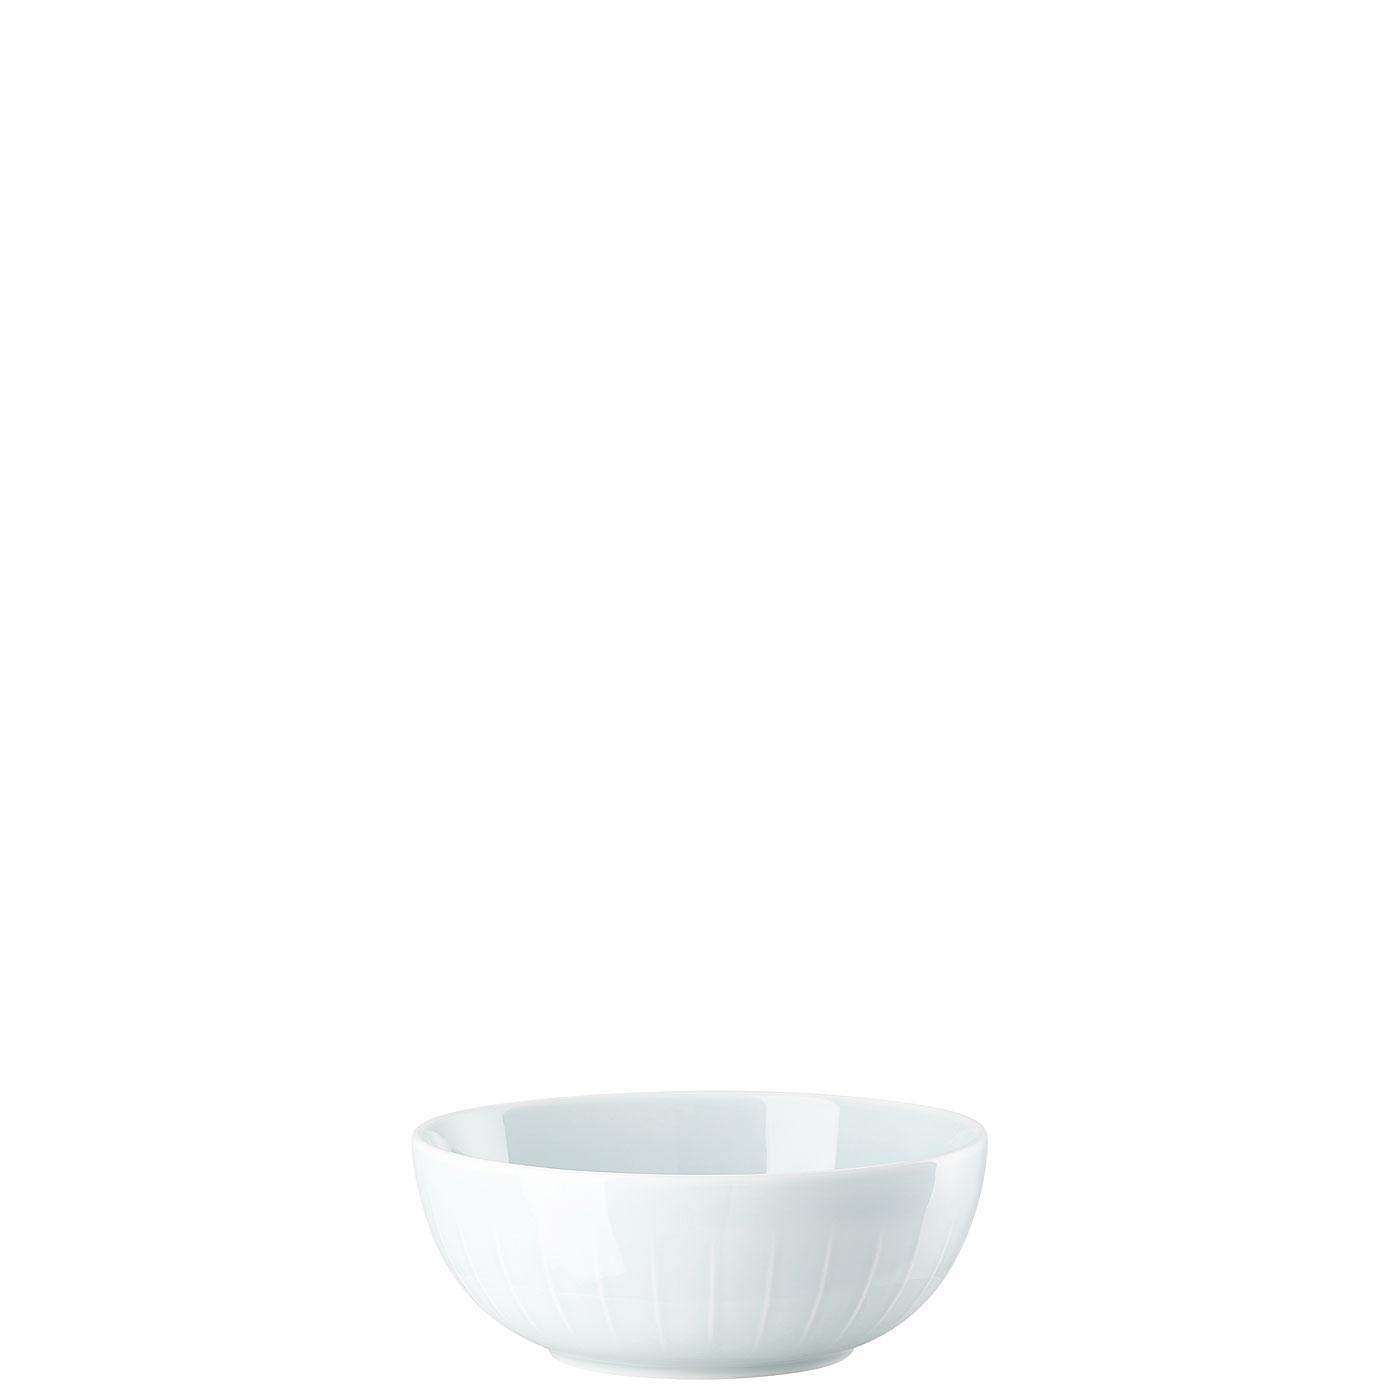 Suppenschale 14 cm Joyn Mint Green Arzberg